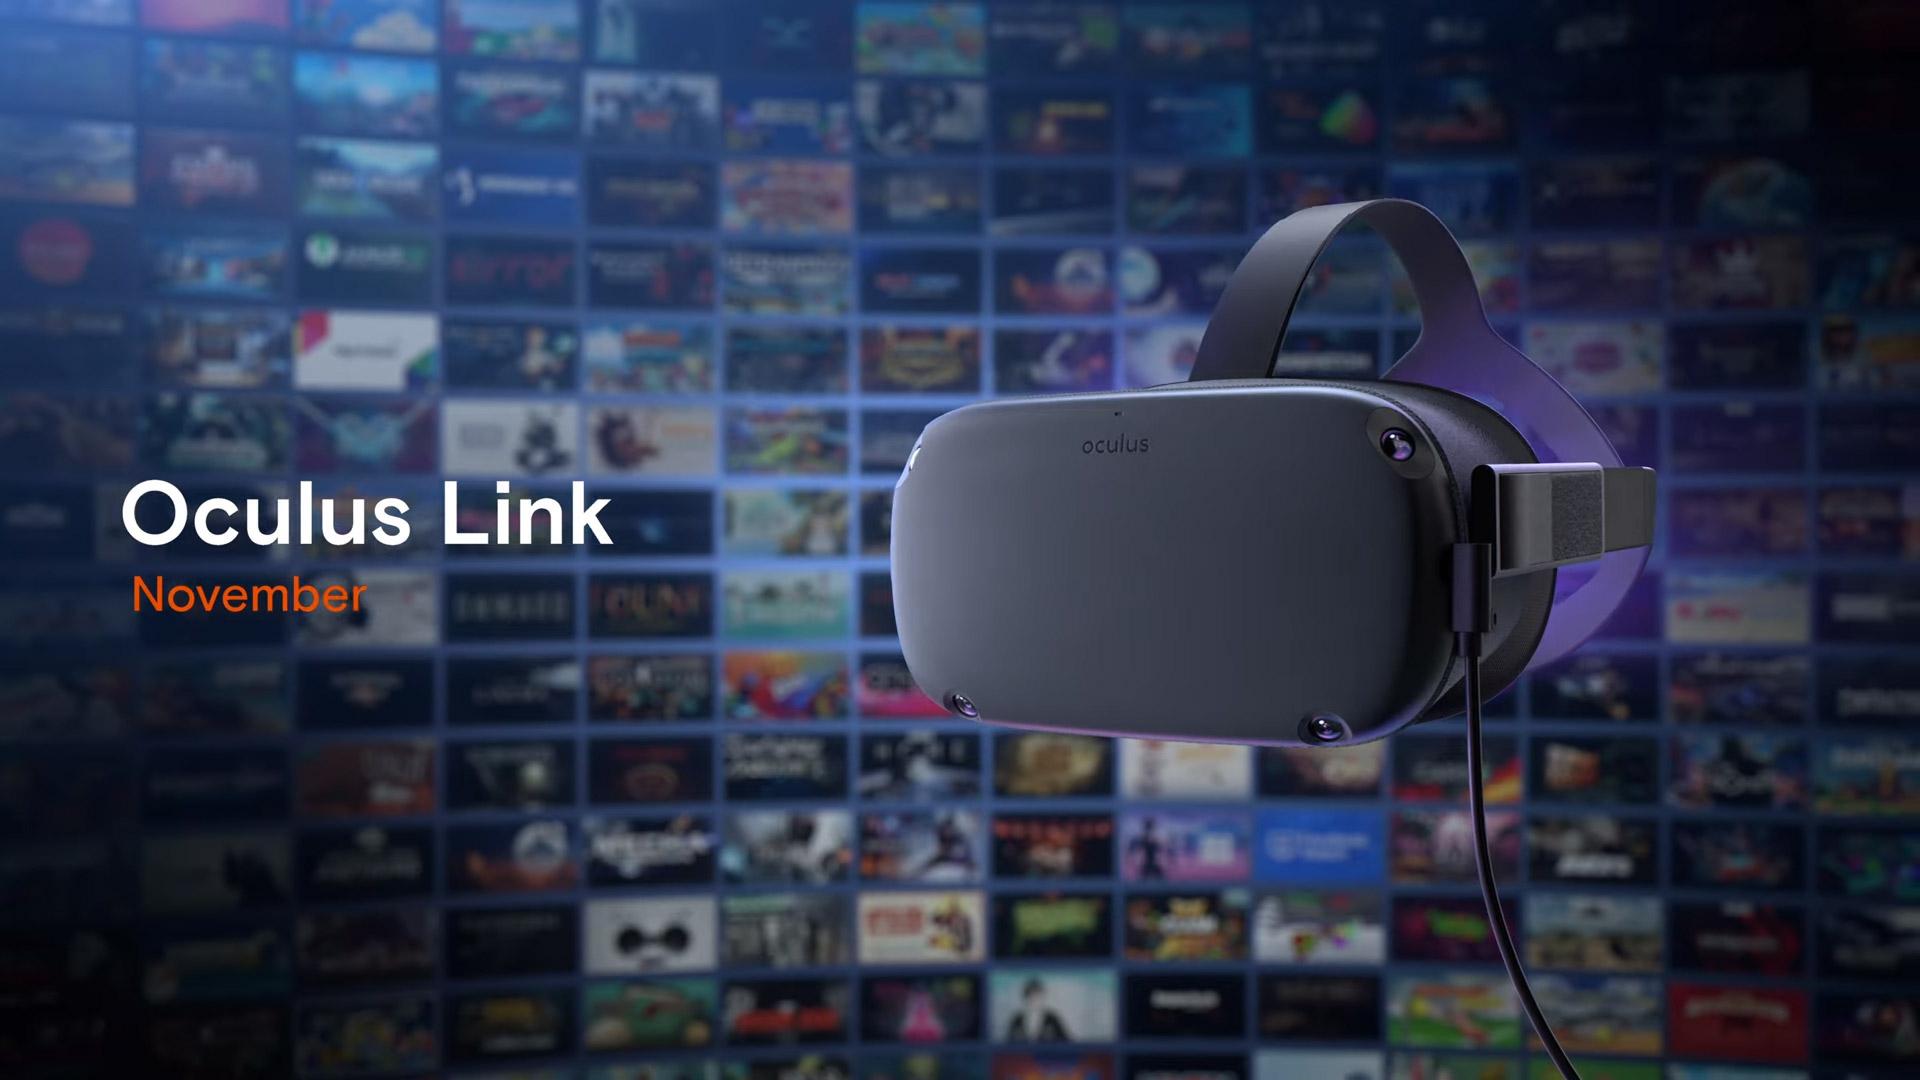 Link Oculus quest